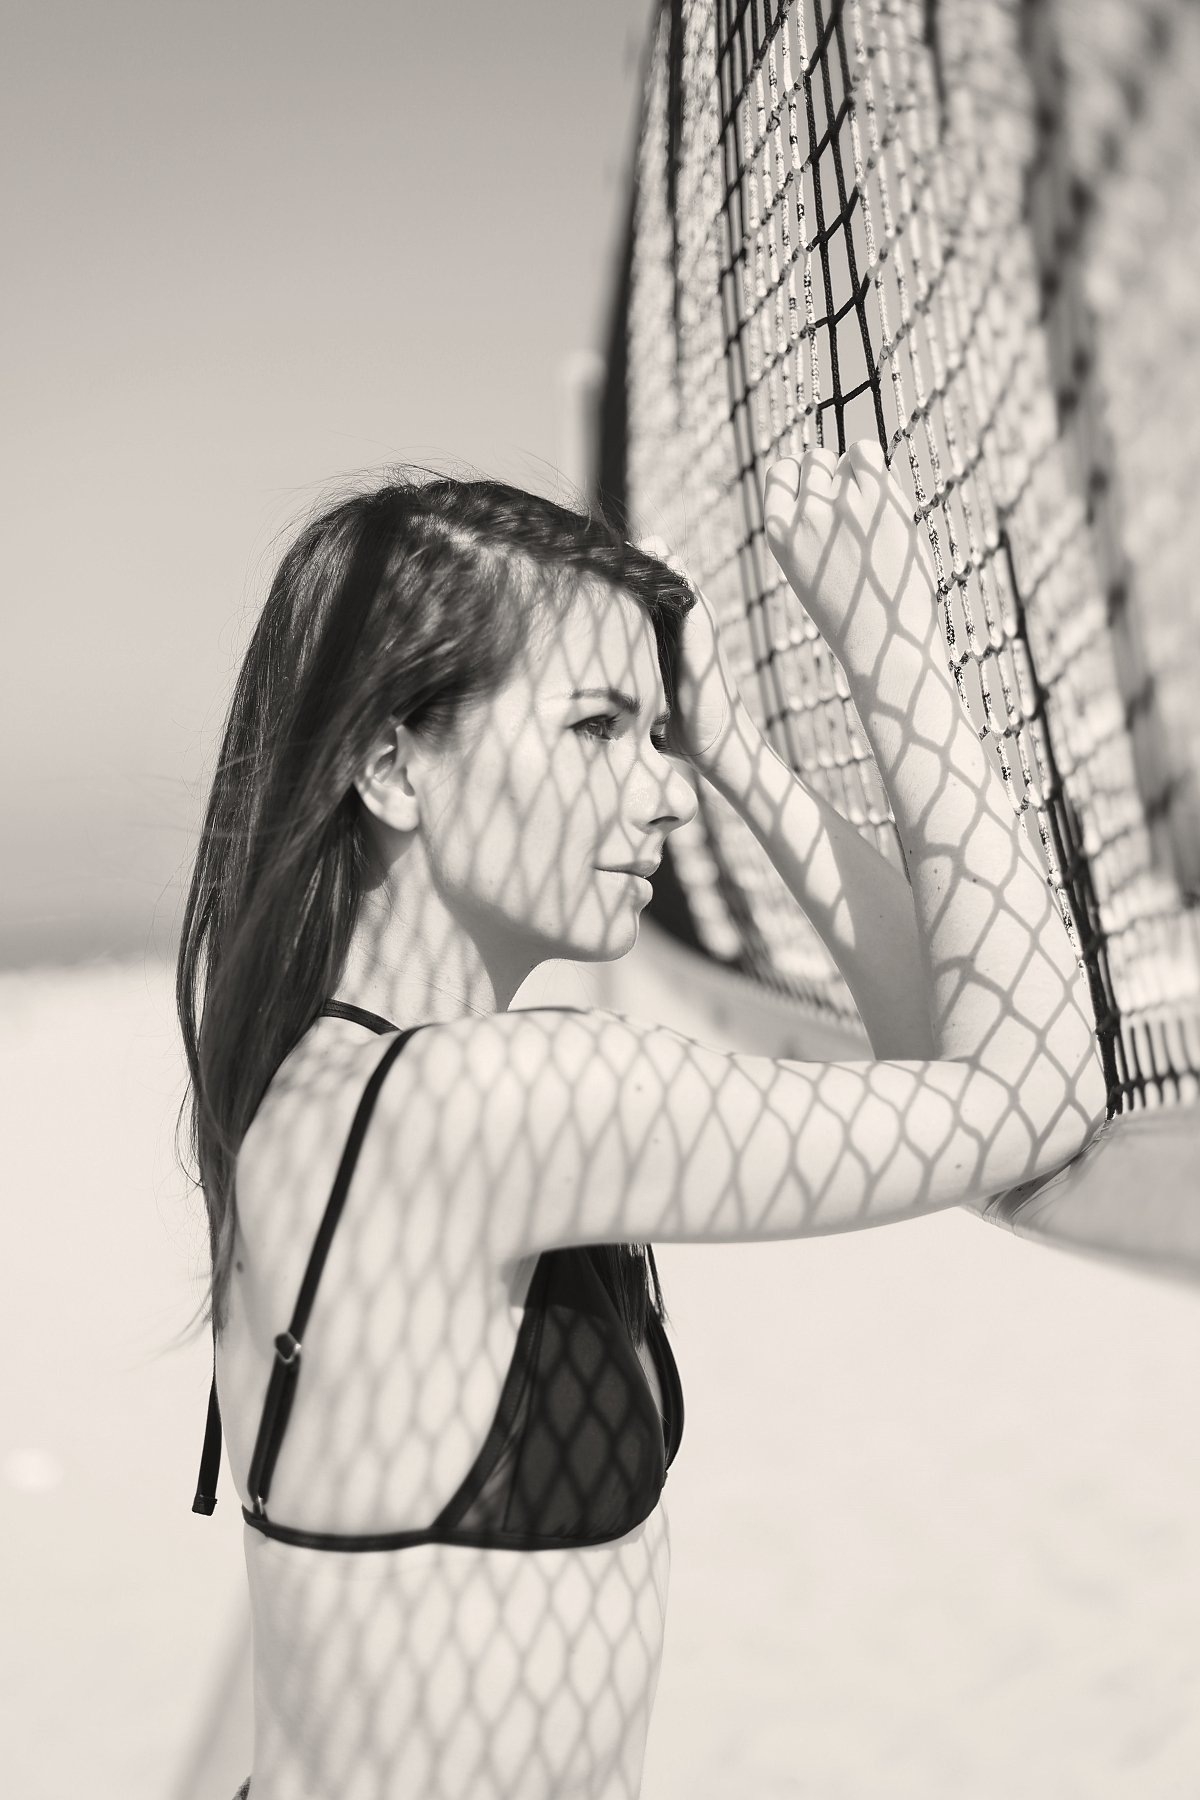 Bikini - sesja na blog